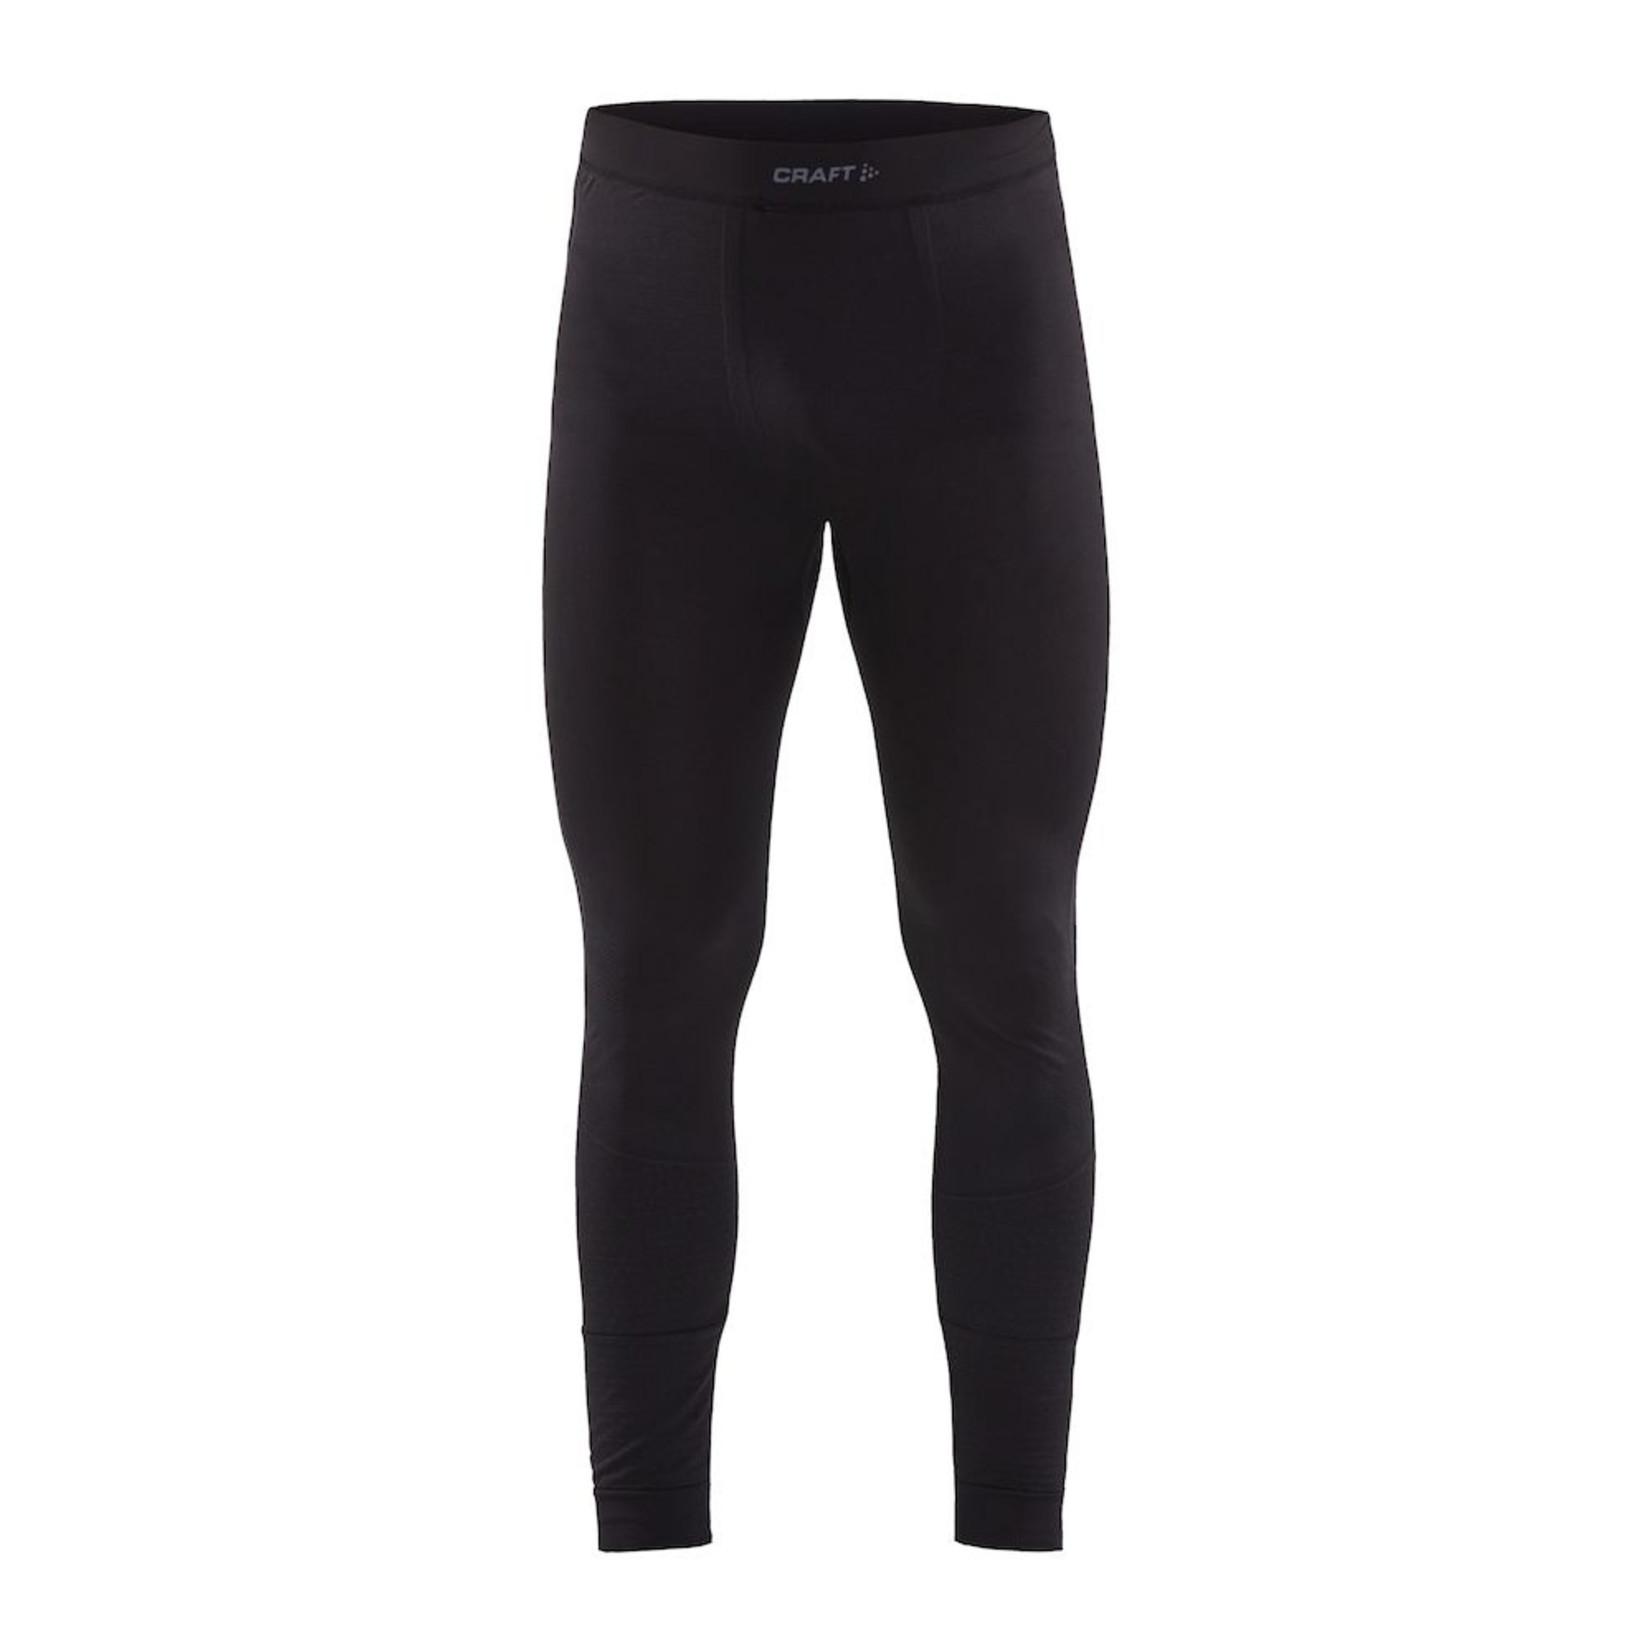 Craft Craft Dry Active Intensity Base Layer Pants Men's